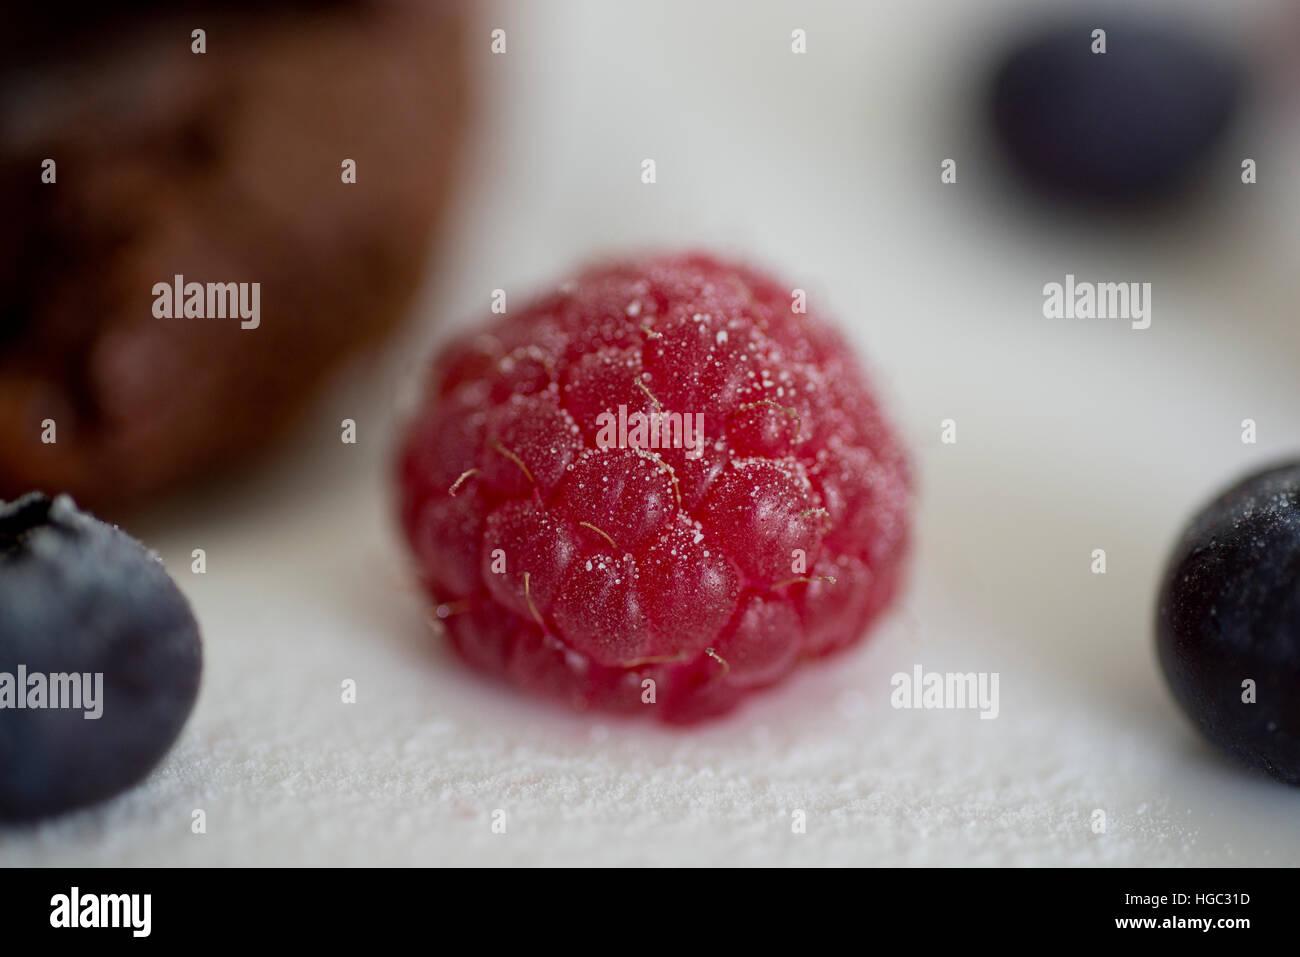 Raspberrie close-up. Makro - Stock Image